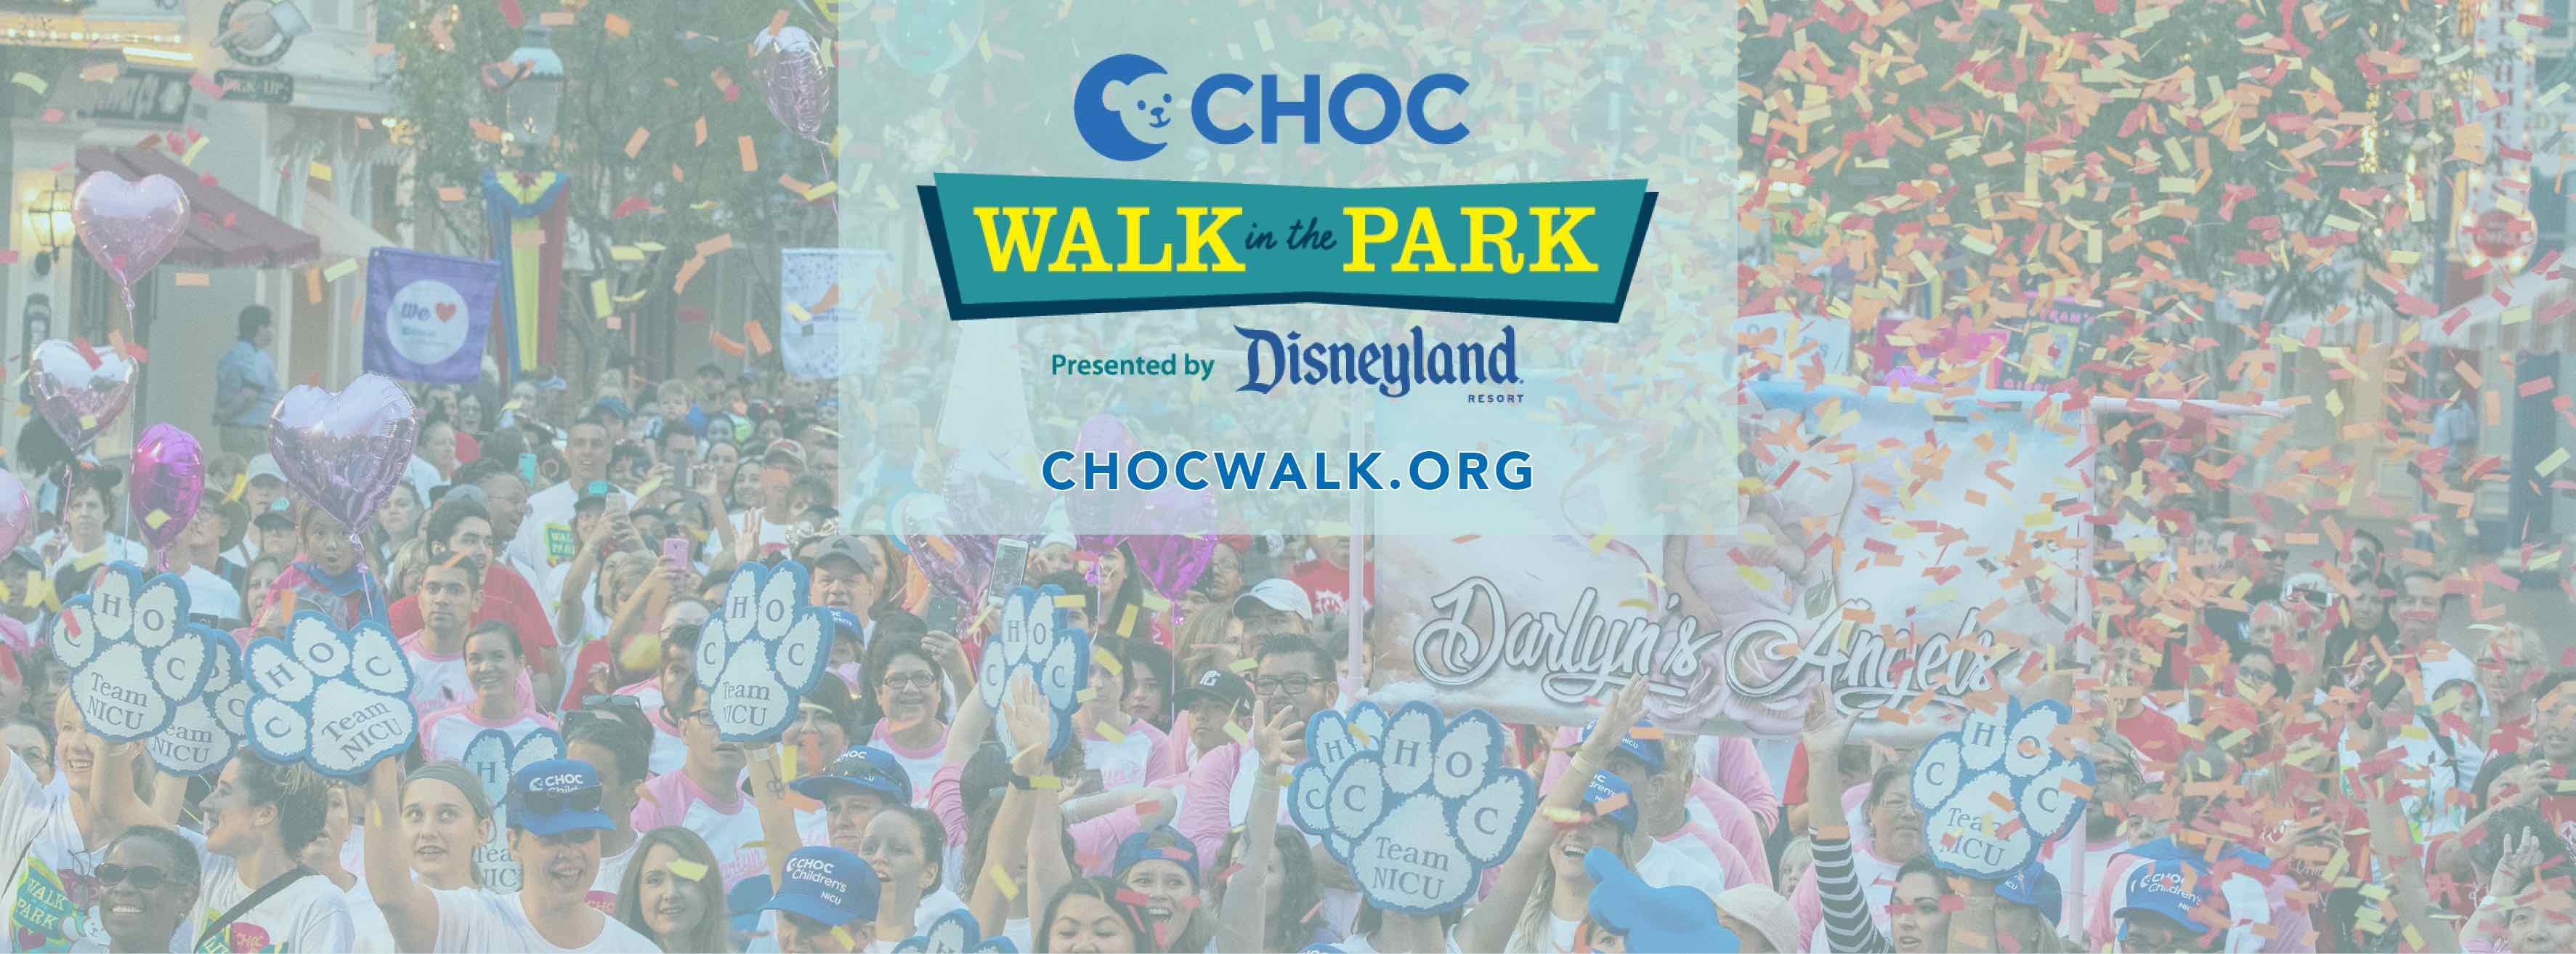 Fundraising Incentives - CHOC Walk 2019